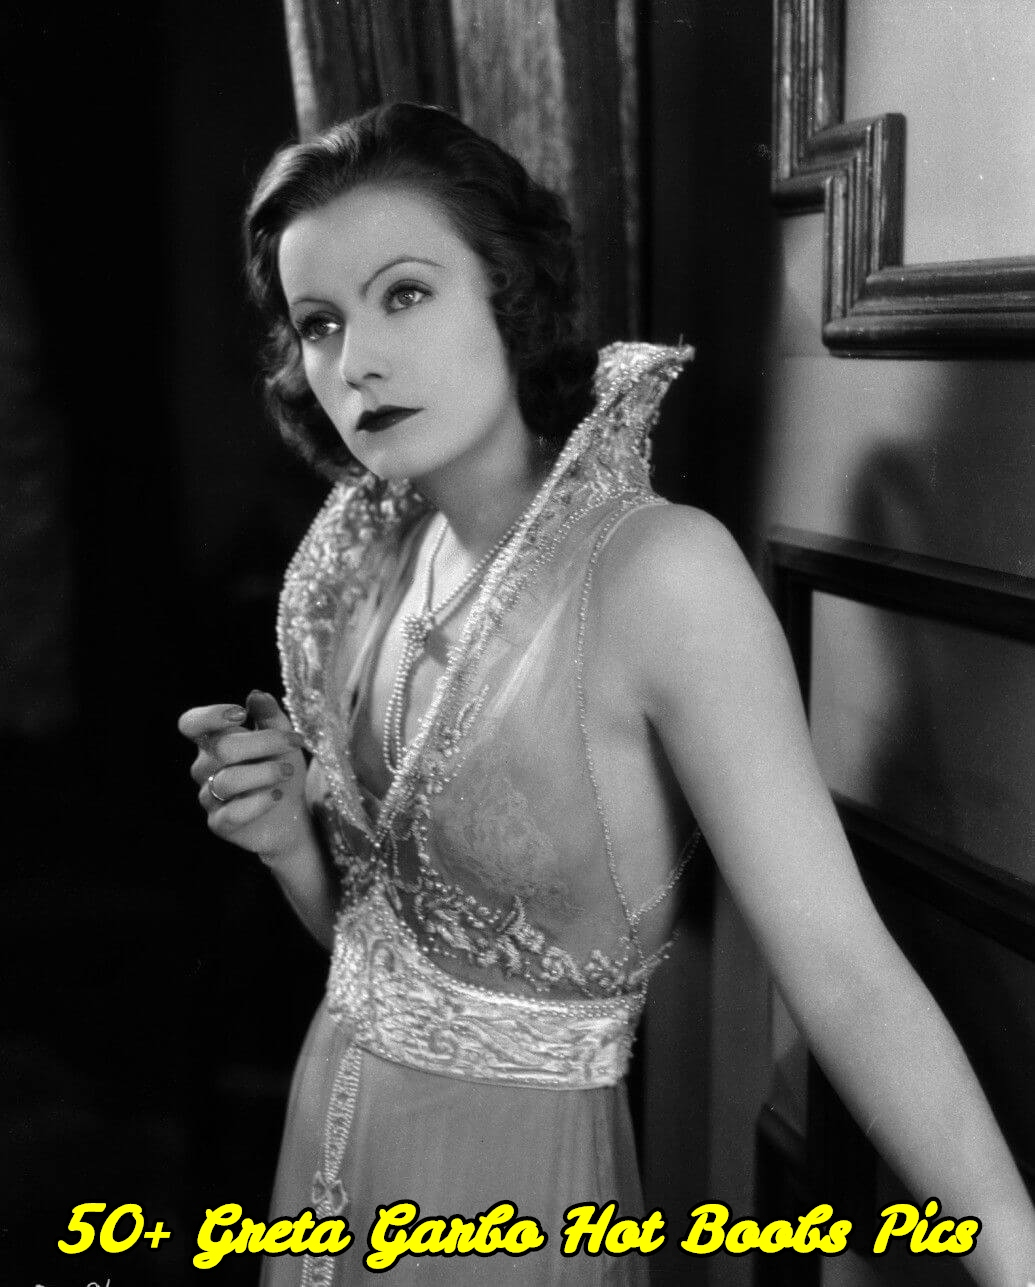 Greta Garbo hot boobs pics